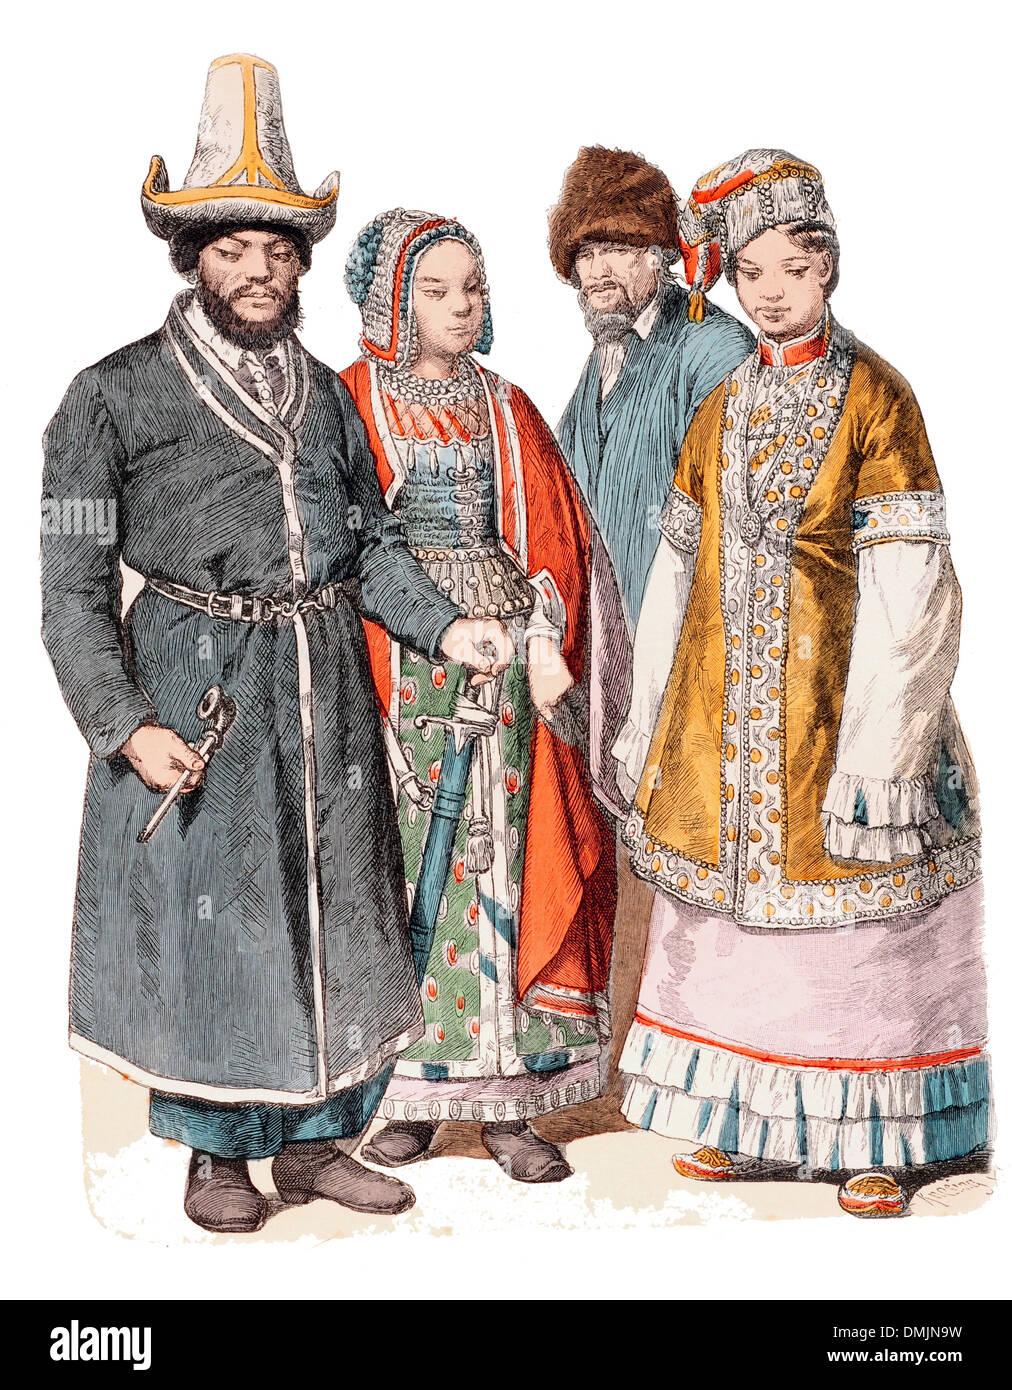 19th-century-xix-%E2%80%A600s-inhabitant